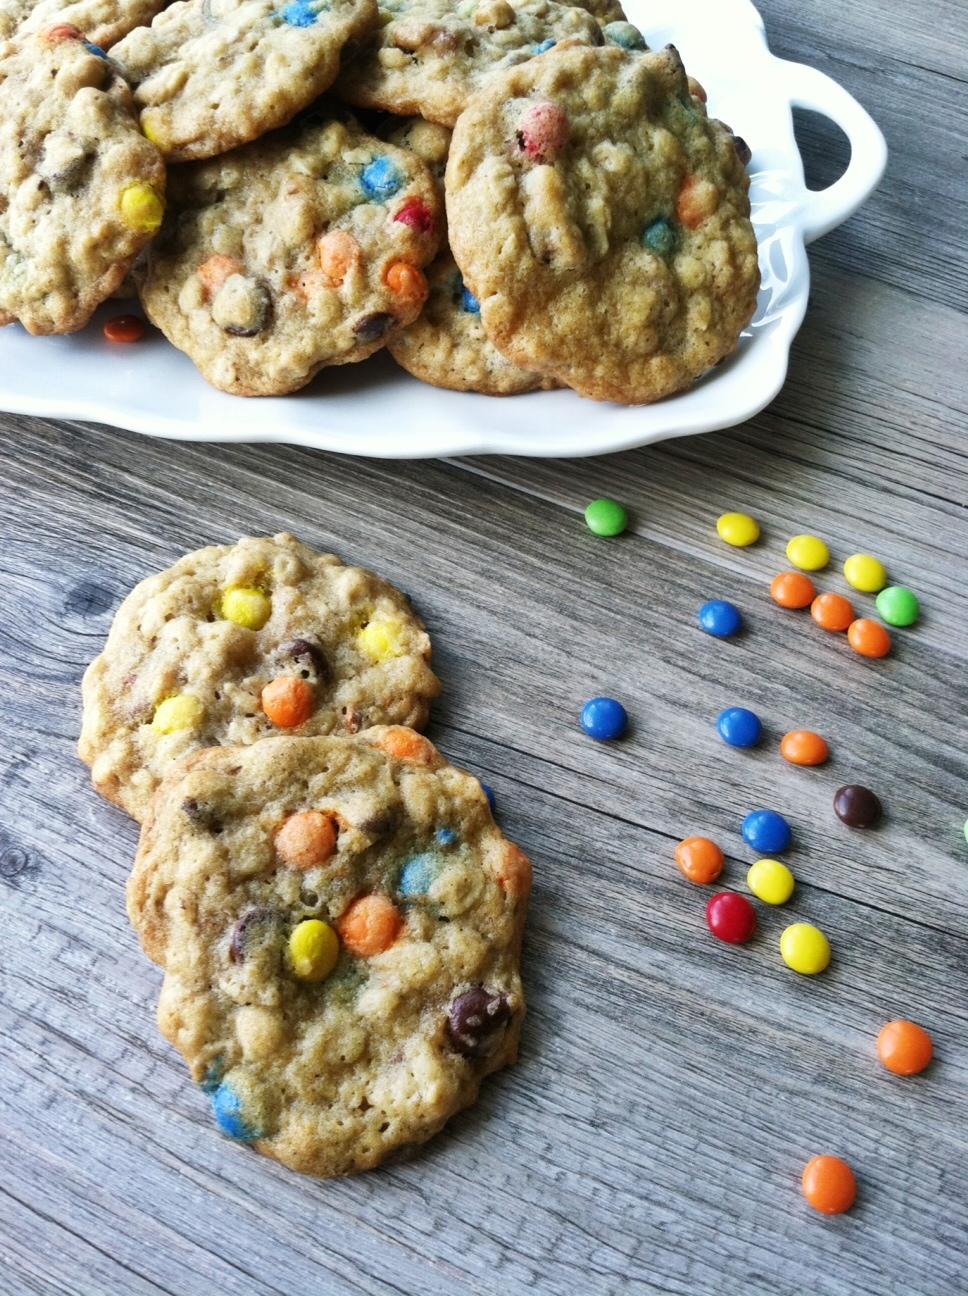 Farmgirl's Crazy Cookies